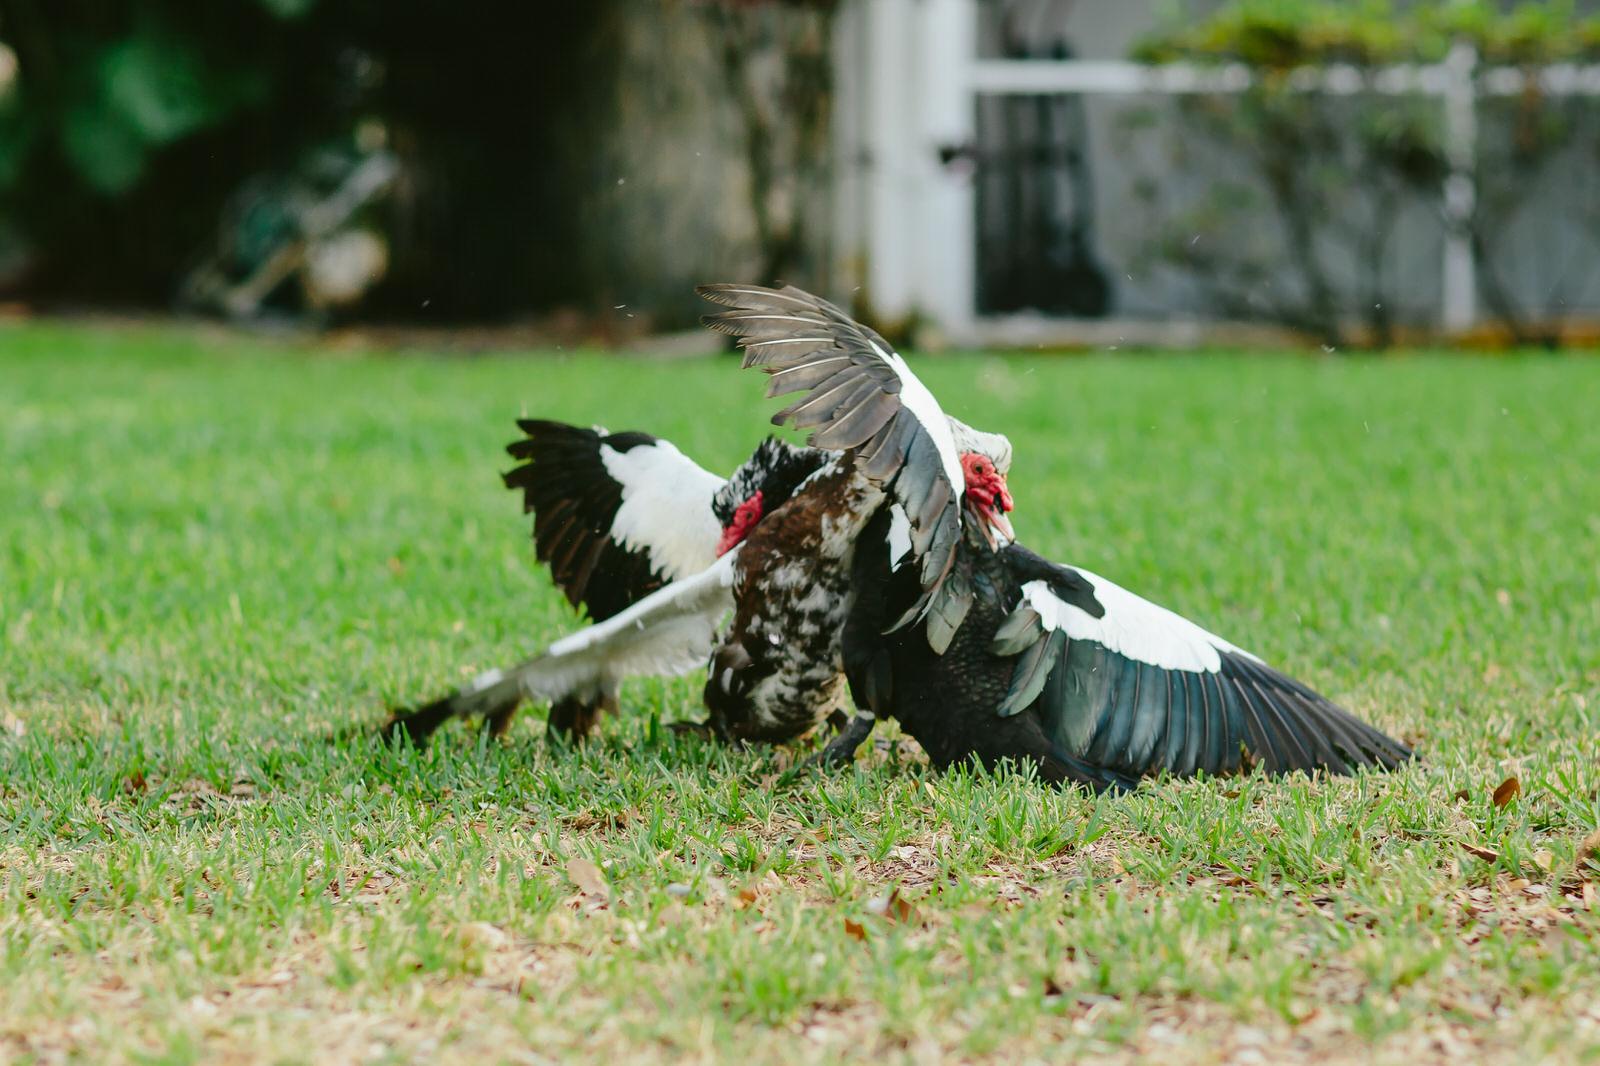 florida-duck-brawl-tiny-house-photo.jpg